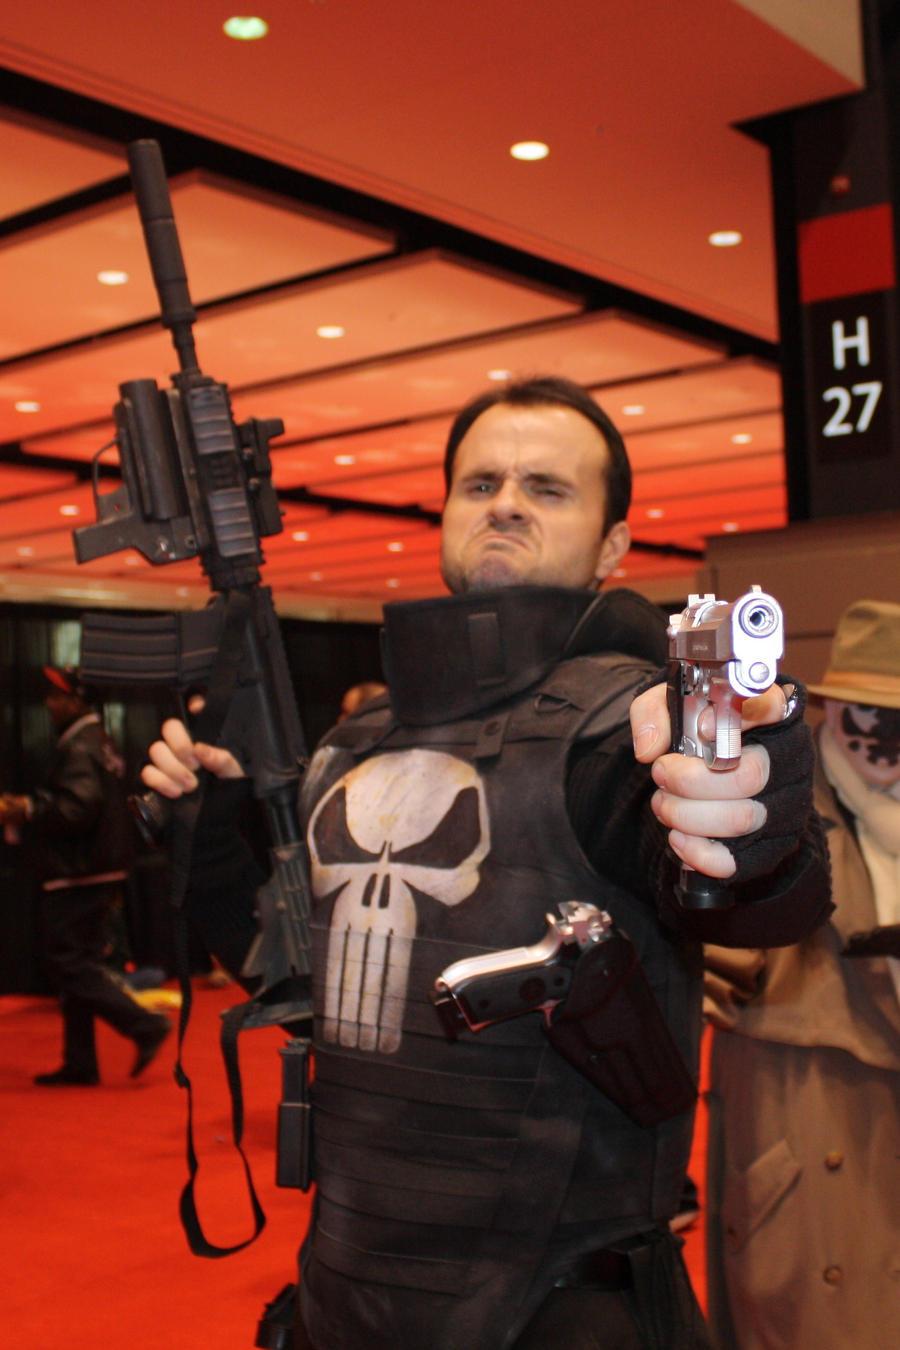 Punisher Warzone Costume 10 by Punisher75 on DeviantArt